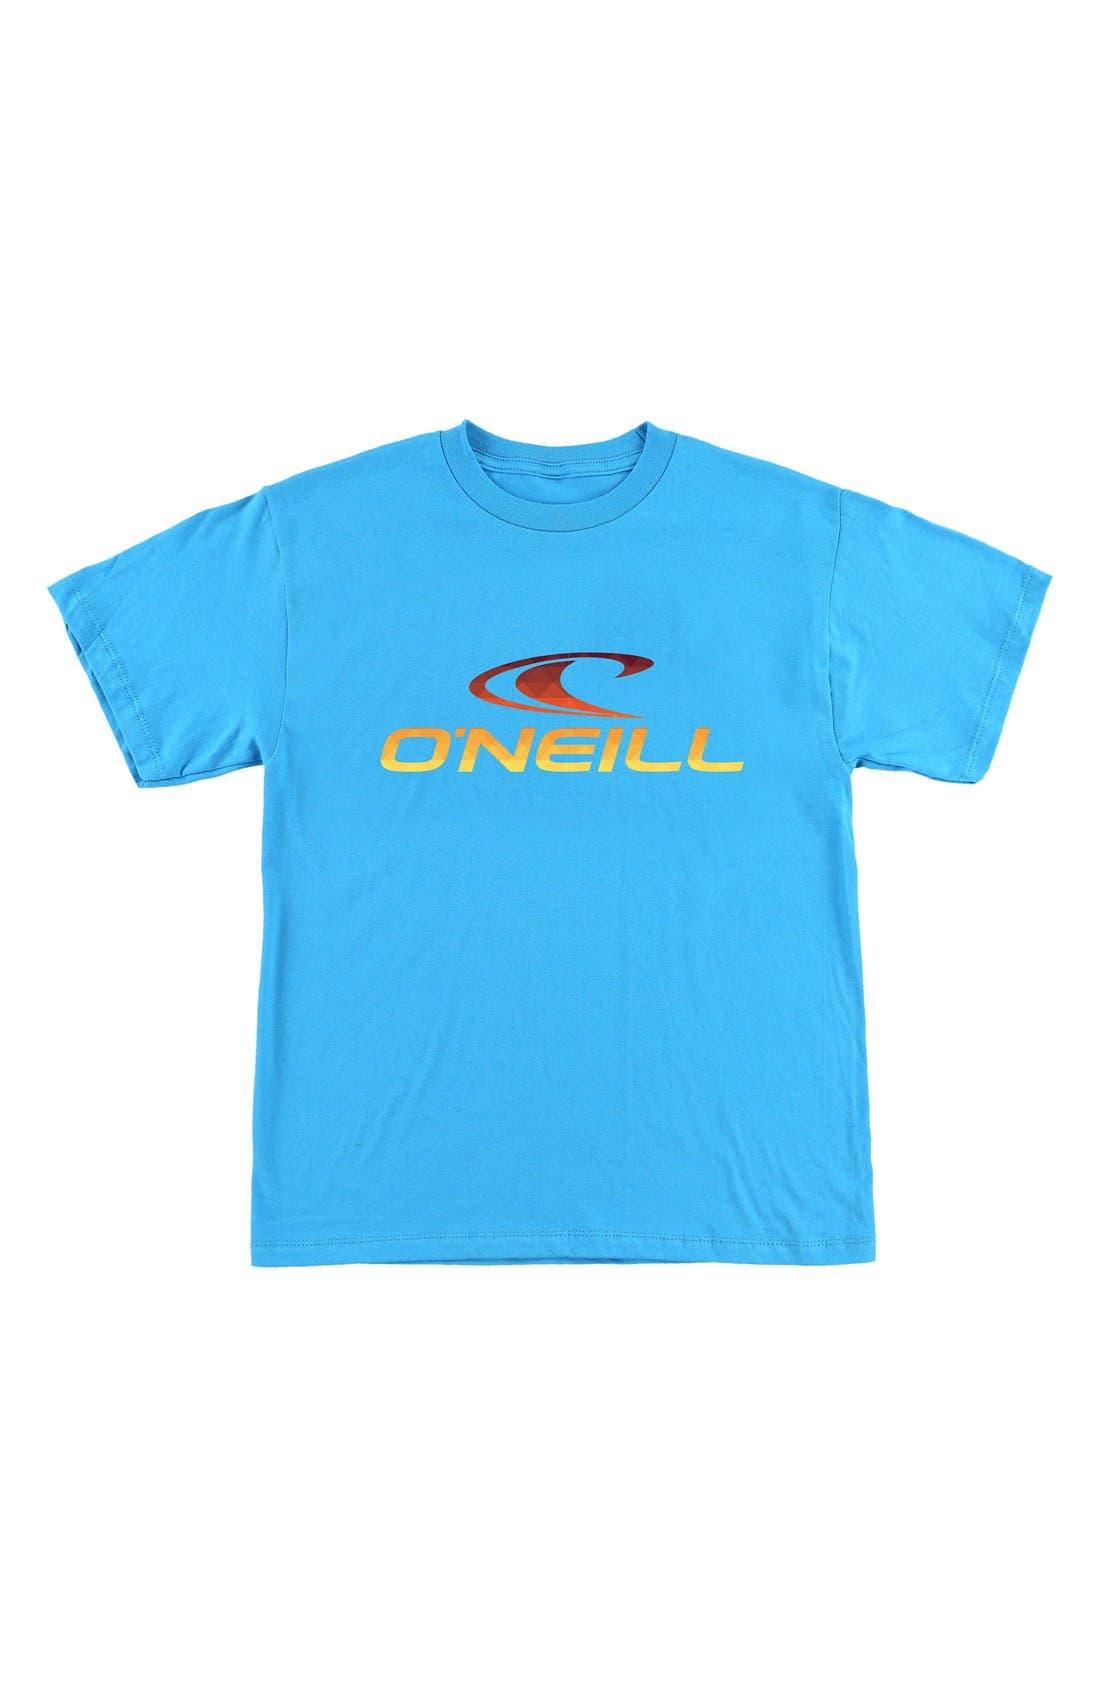 O'NEILL Prism Graphic T-Shirt